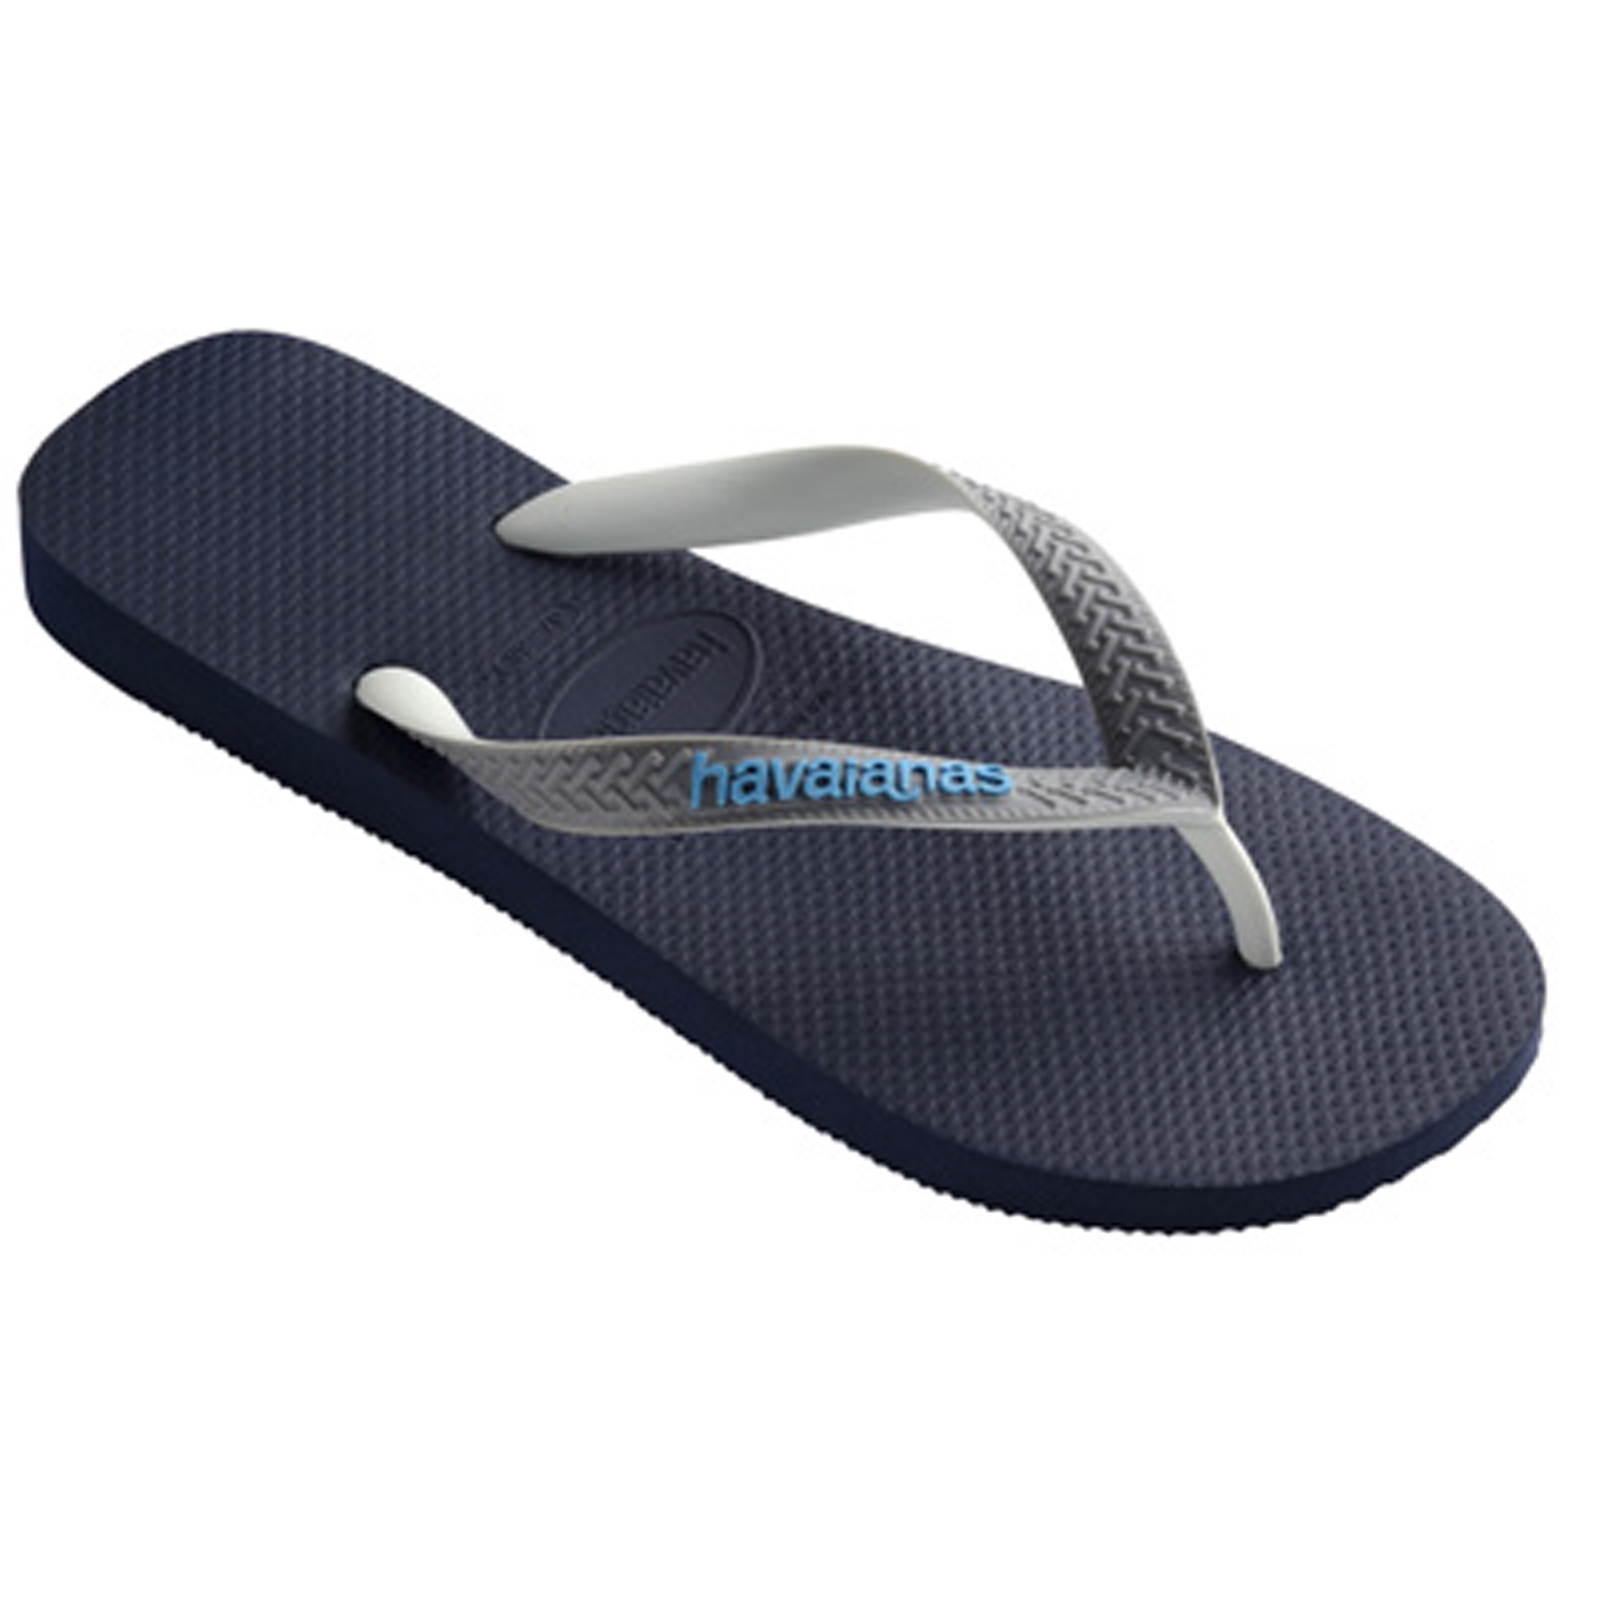 dea81e3e7 Flip-Flops Top Mix Navy Blue-steel Grey - Brand Havaianas